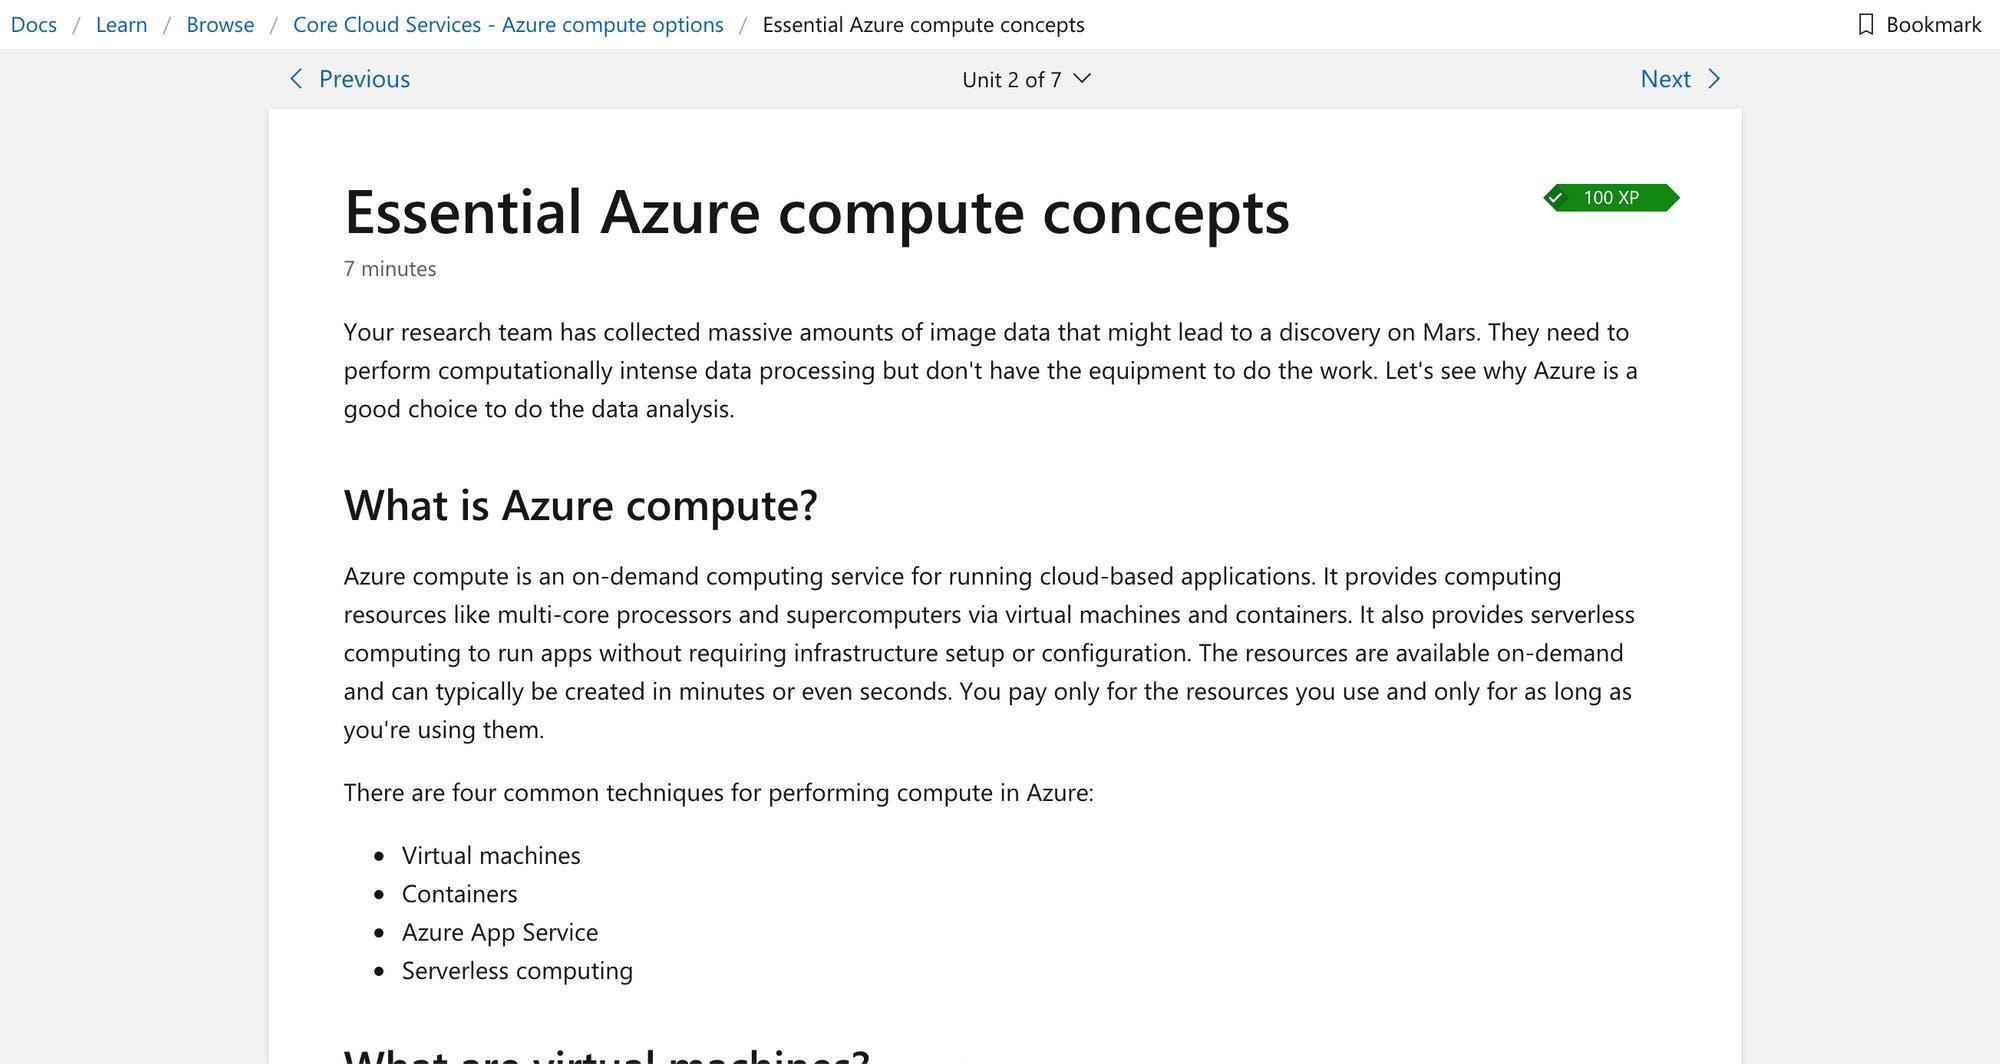 Azure fundamentals learning path